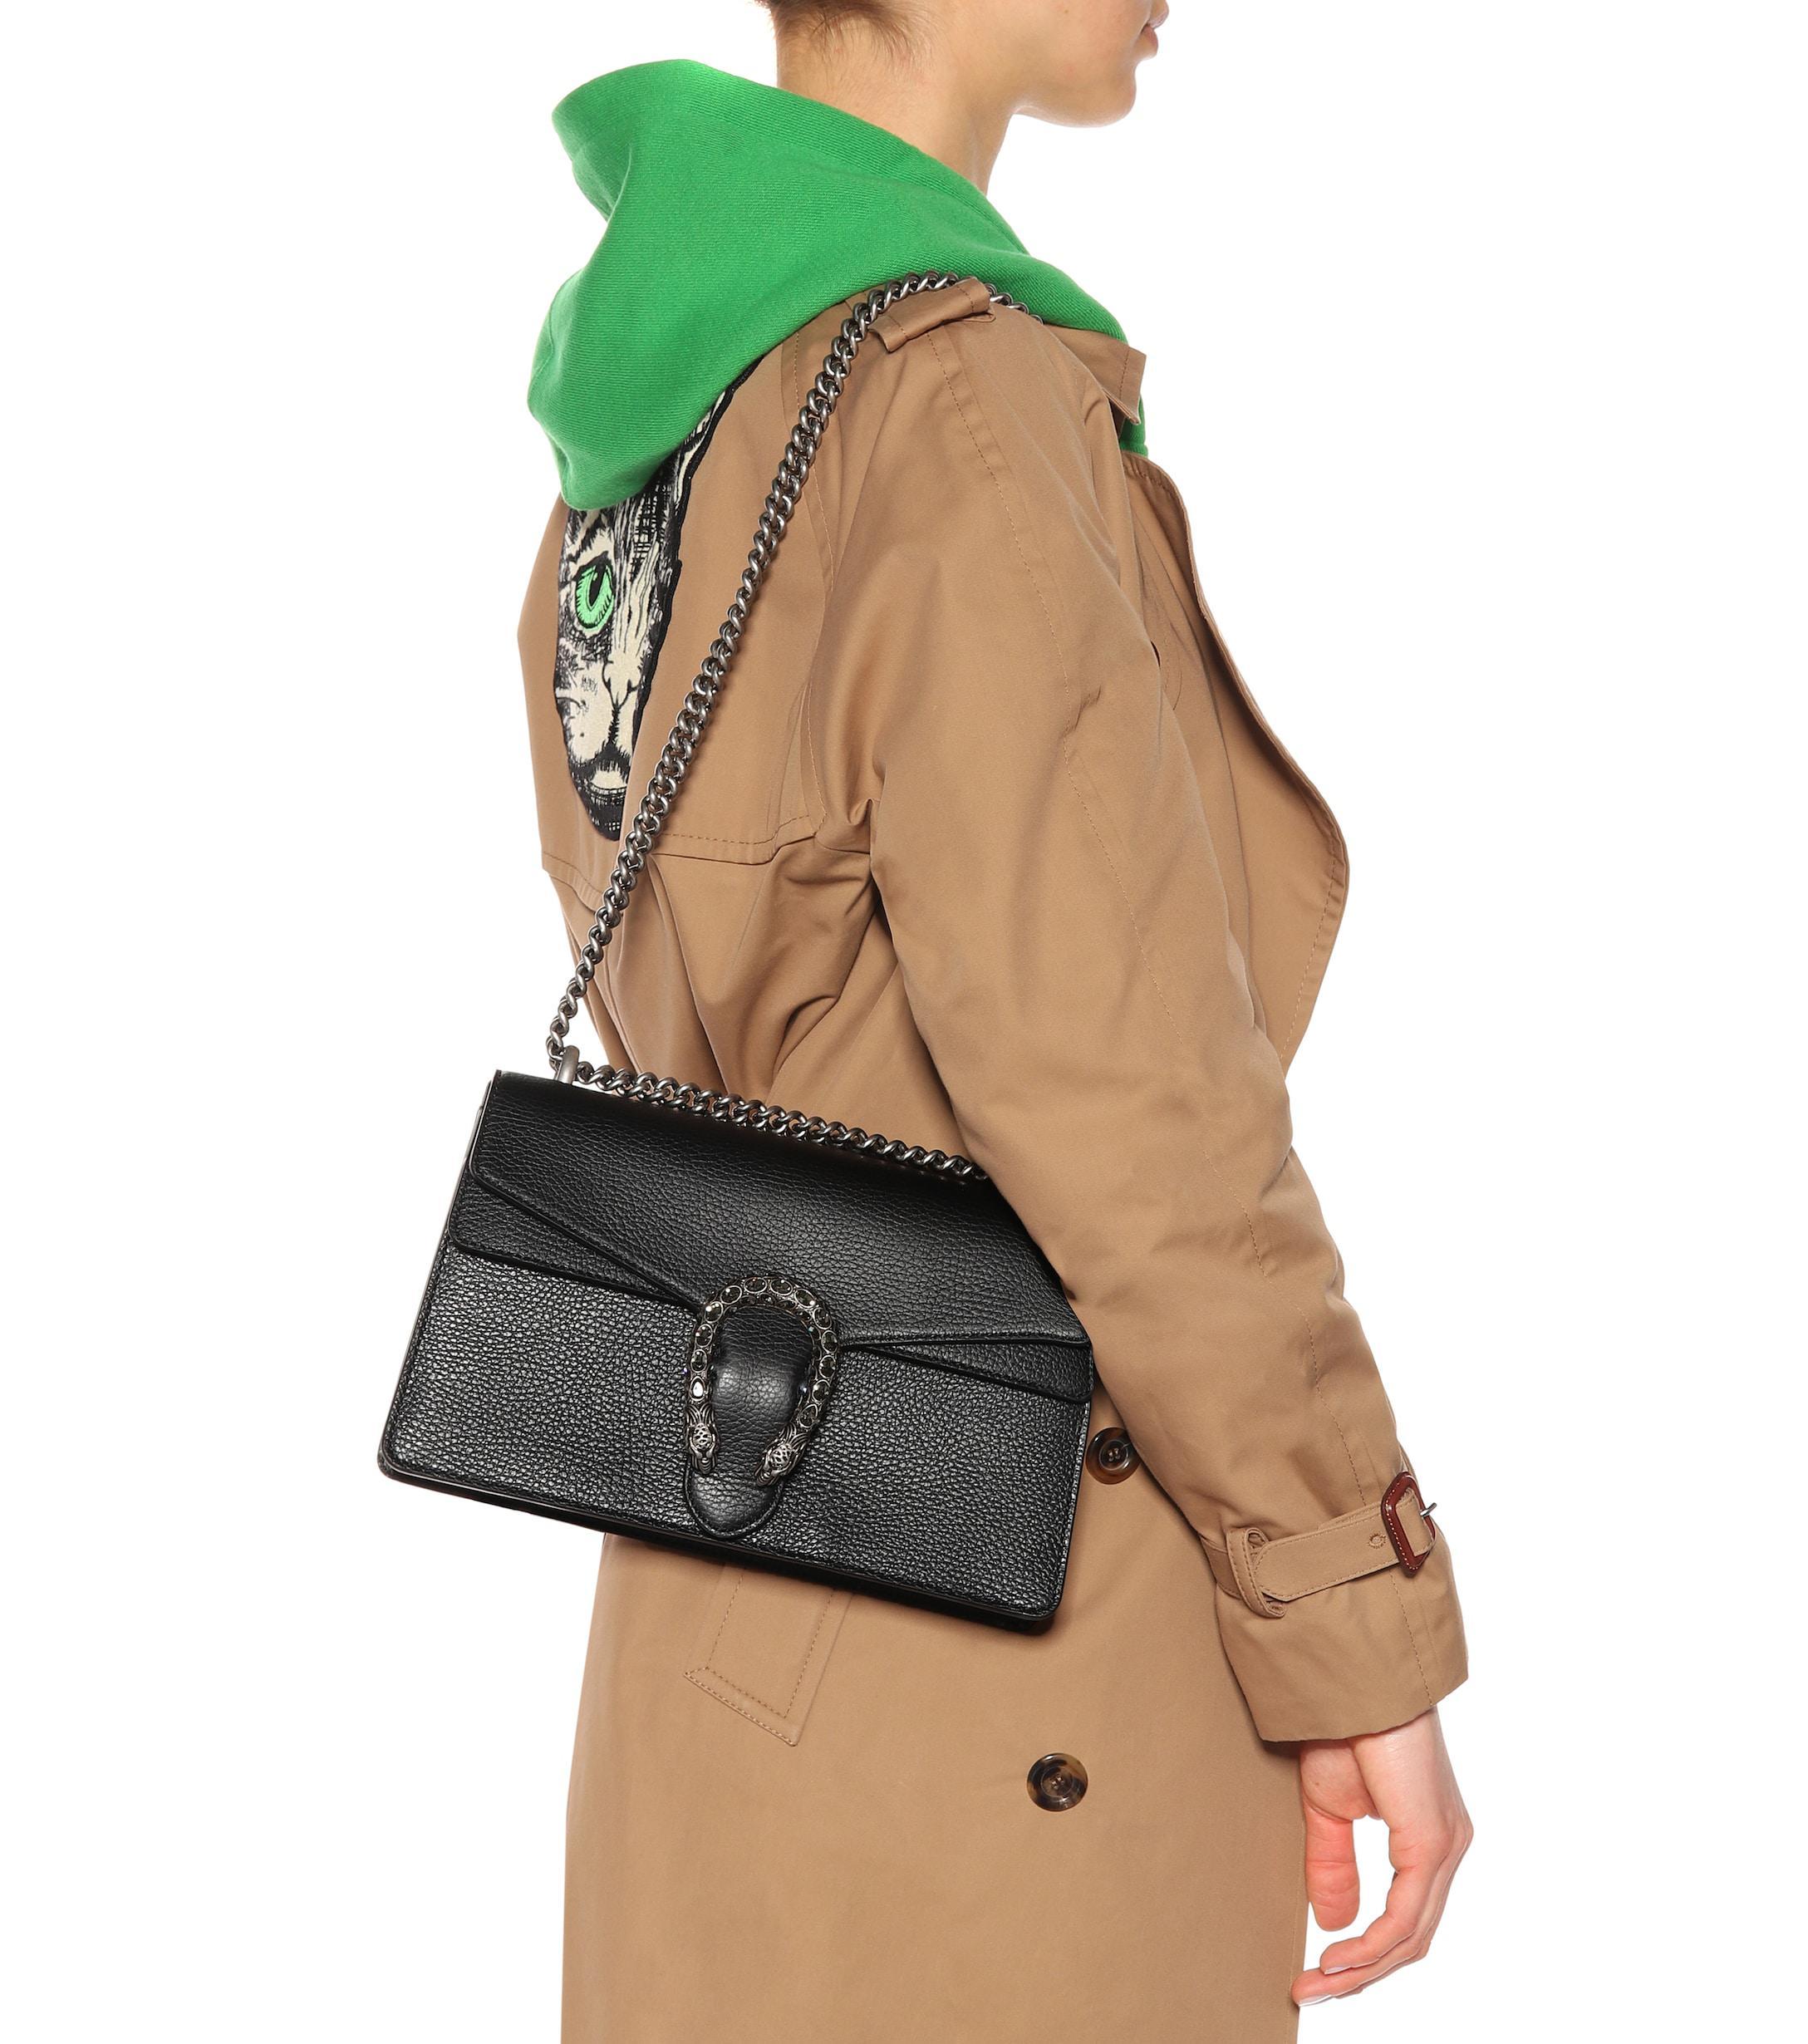 0a7fe4d74ef36 Gucci - Black Small Leather Dionysus Shoulder Bag - Lyst. View fullscreen